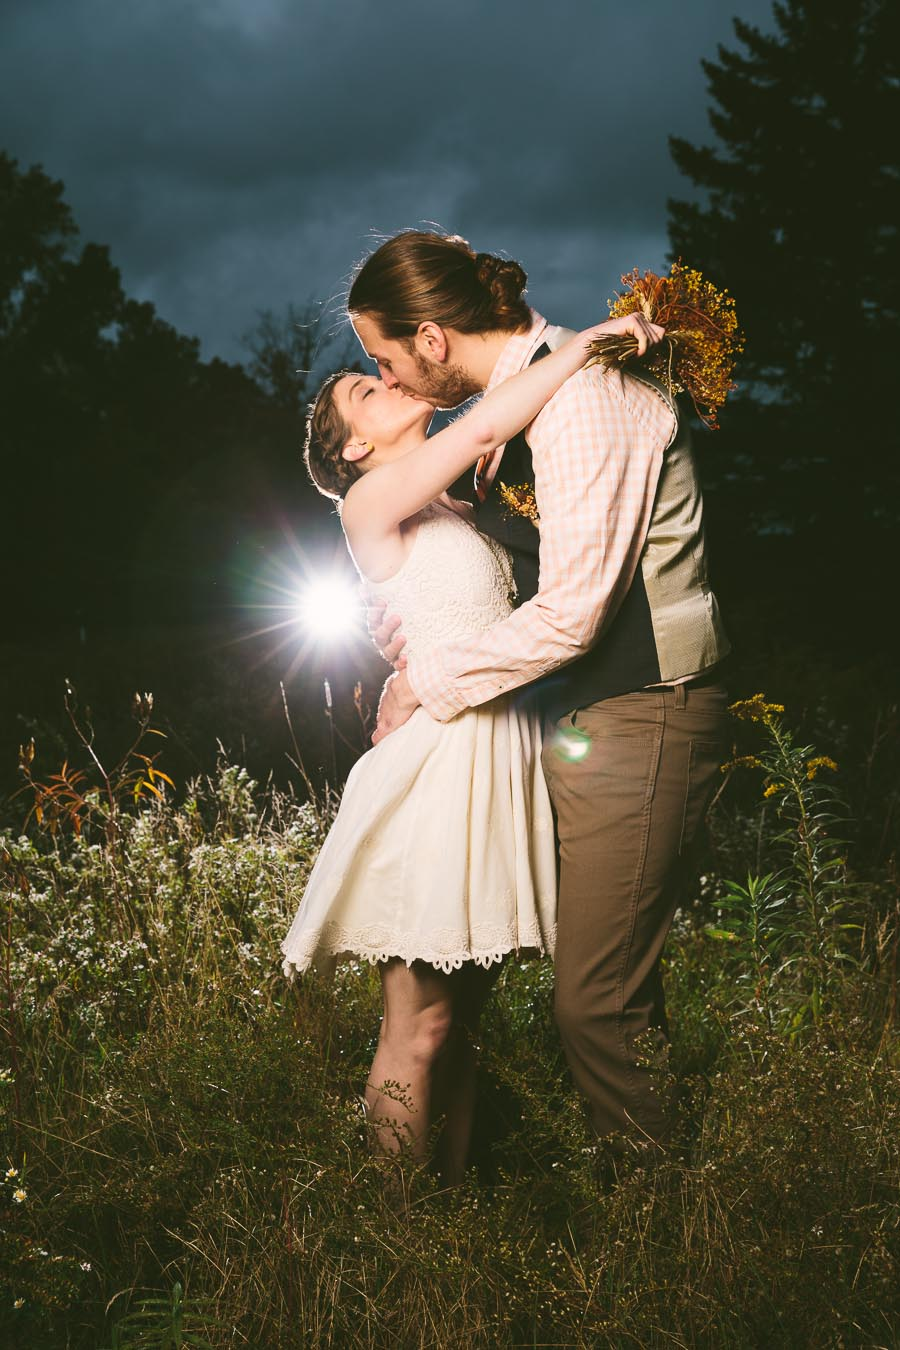 chesterland-ohio-wedding-photography-orchard-hills-paterson-fruit-farm-27.jpg